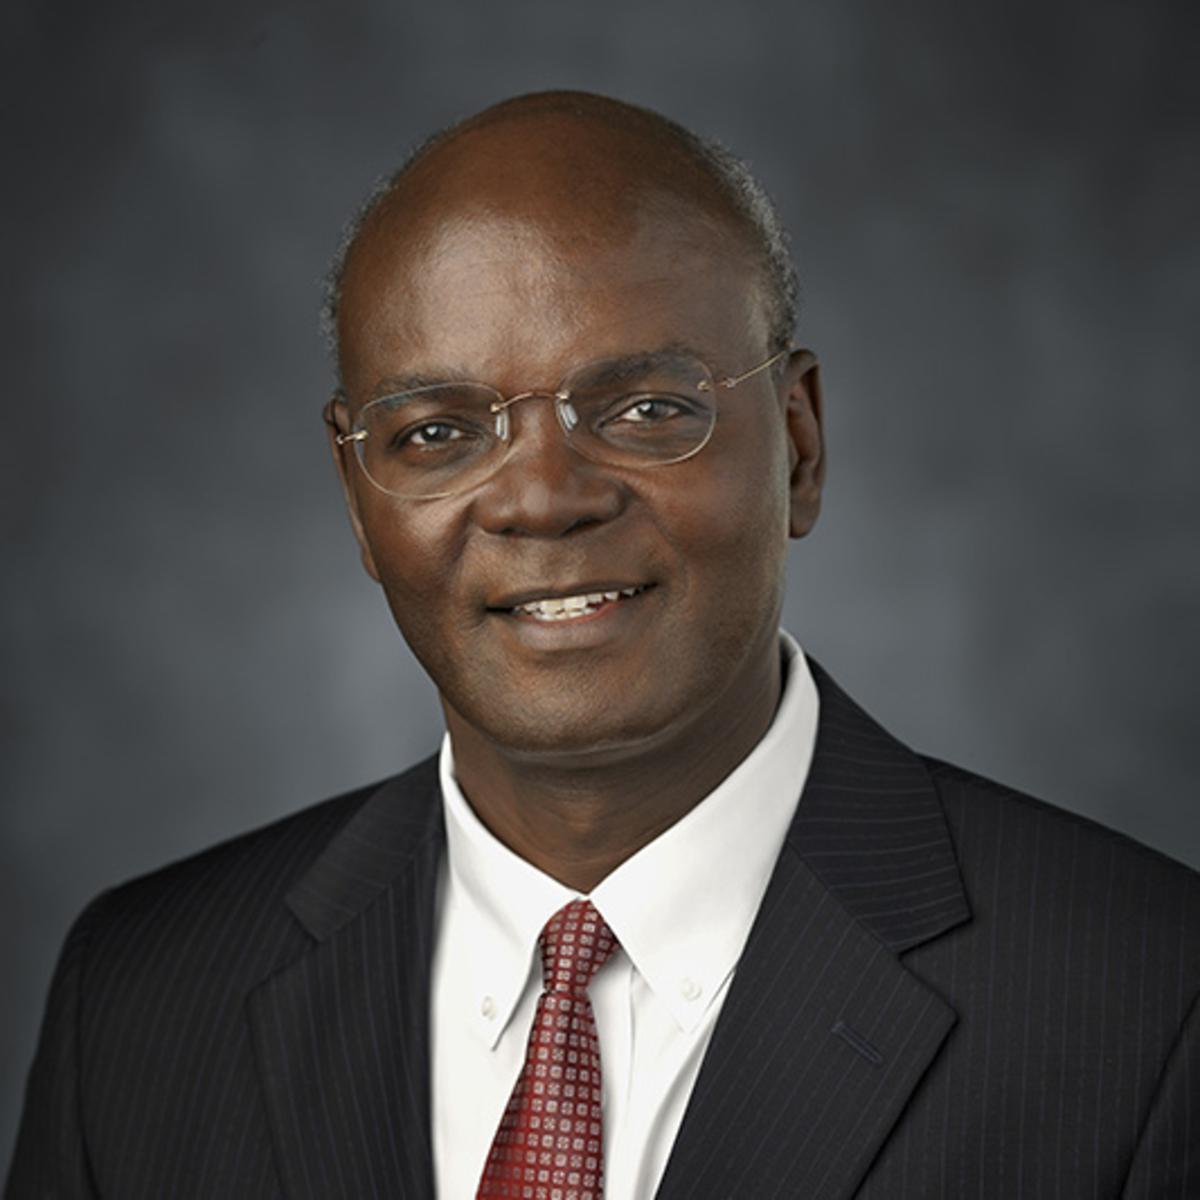 Joseph W. Sitati